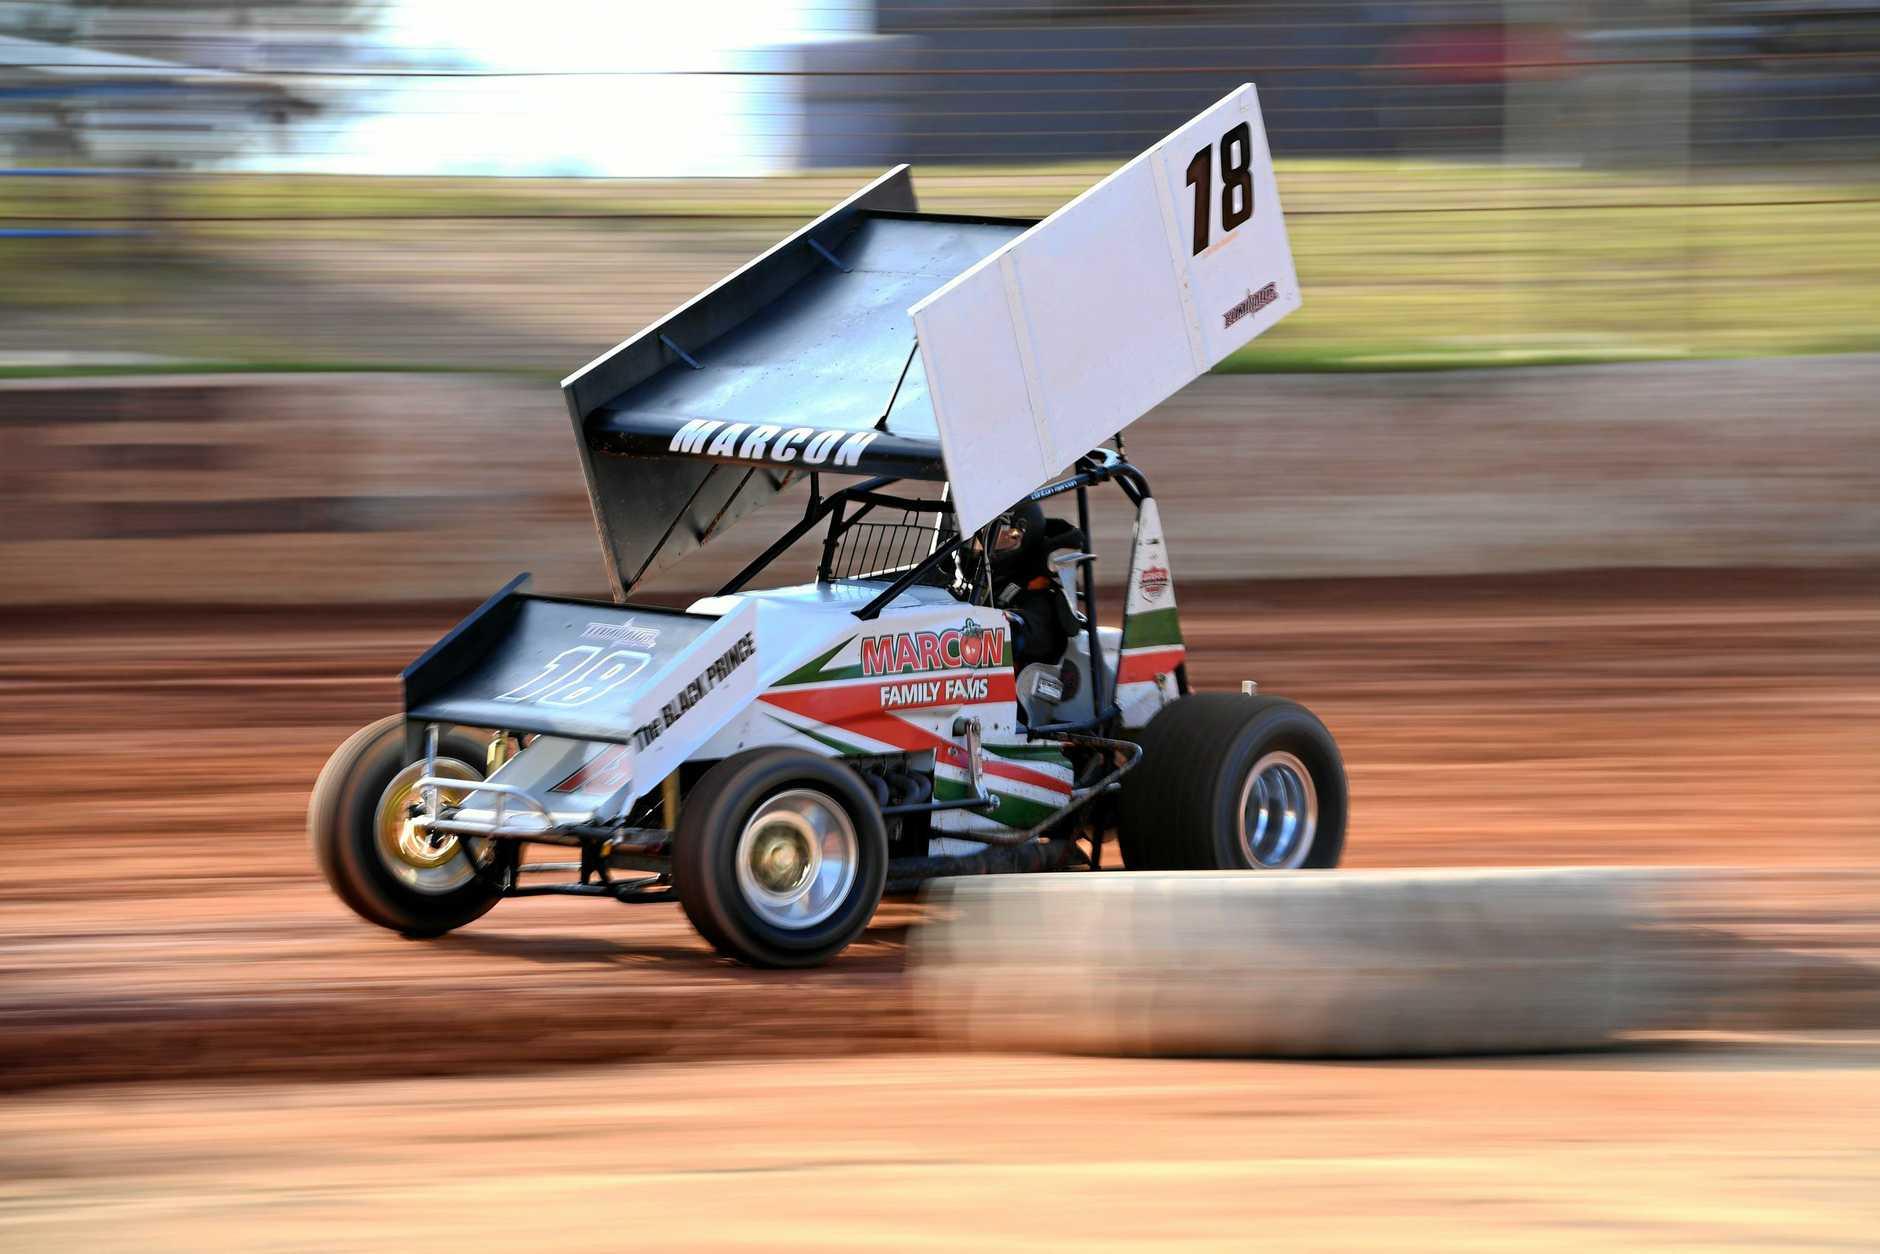 MOTOR RACING: Clinton Marcon racing at Carina Speedway.